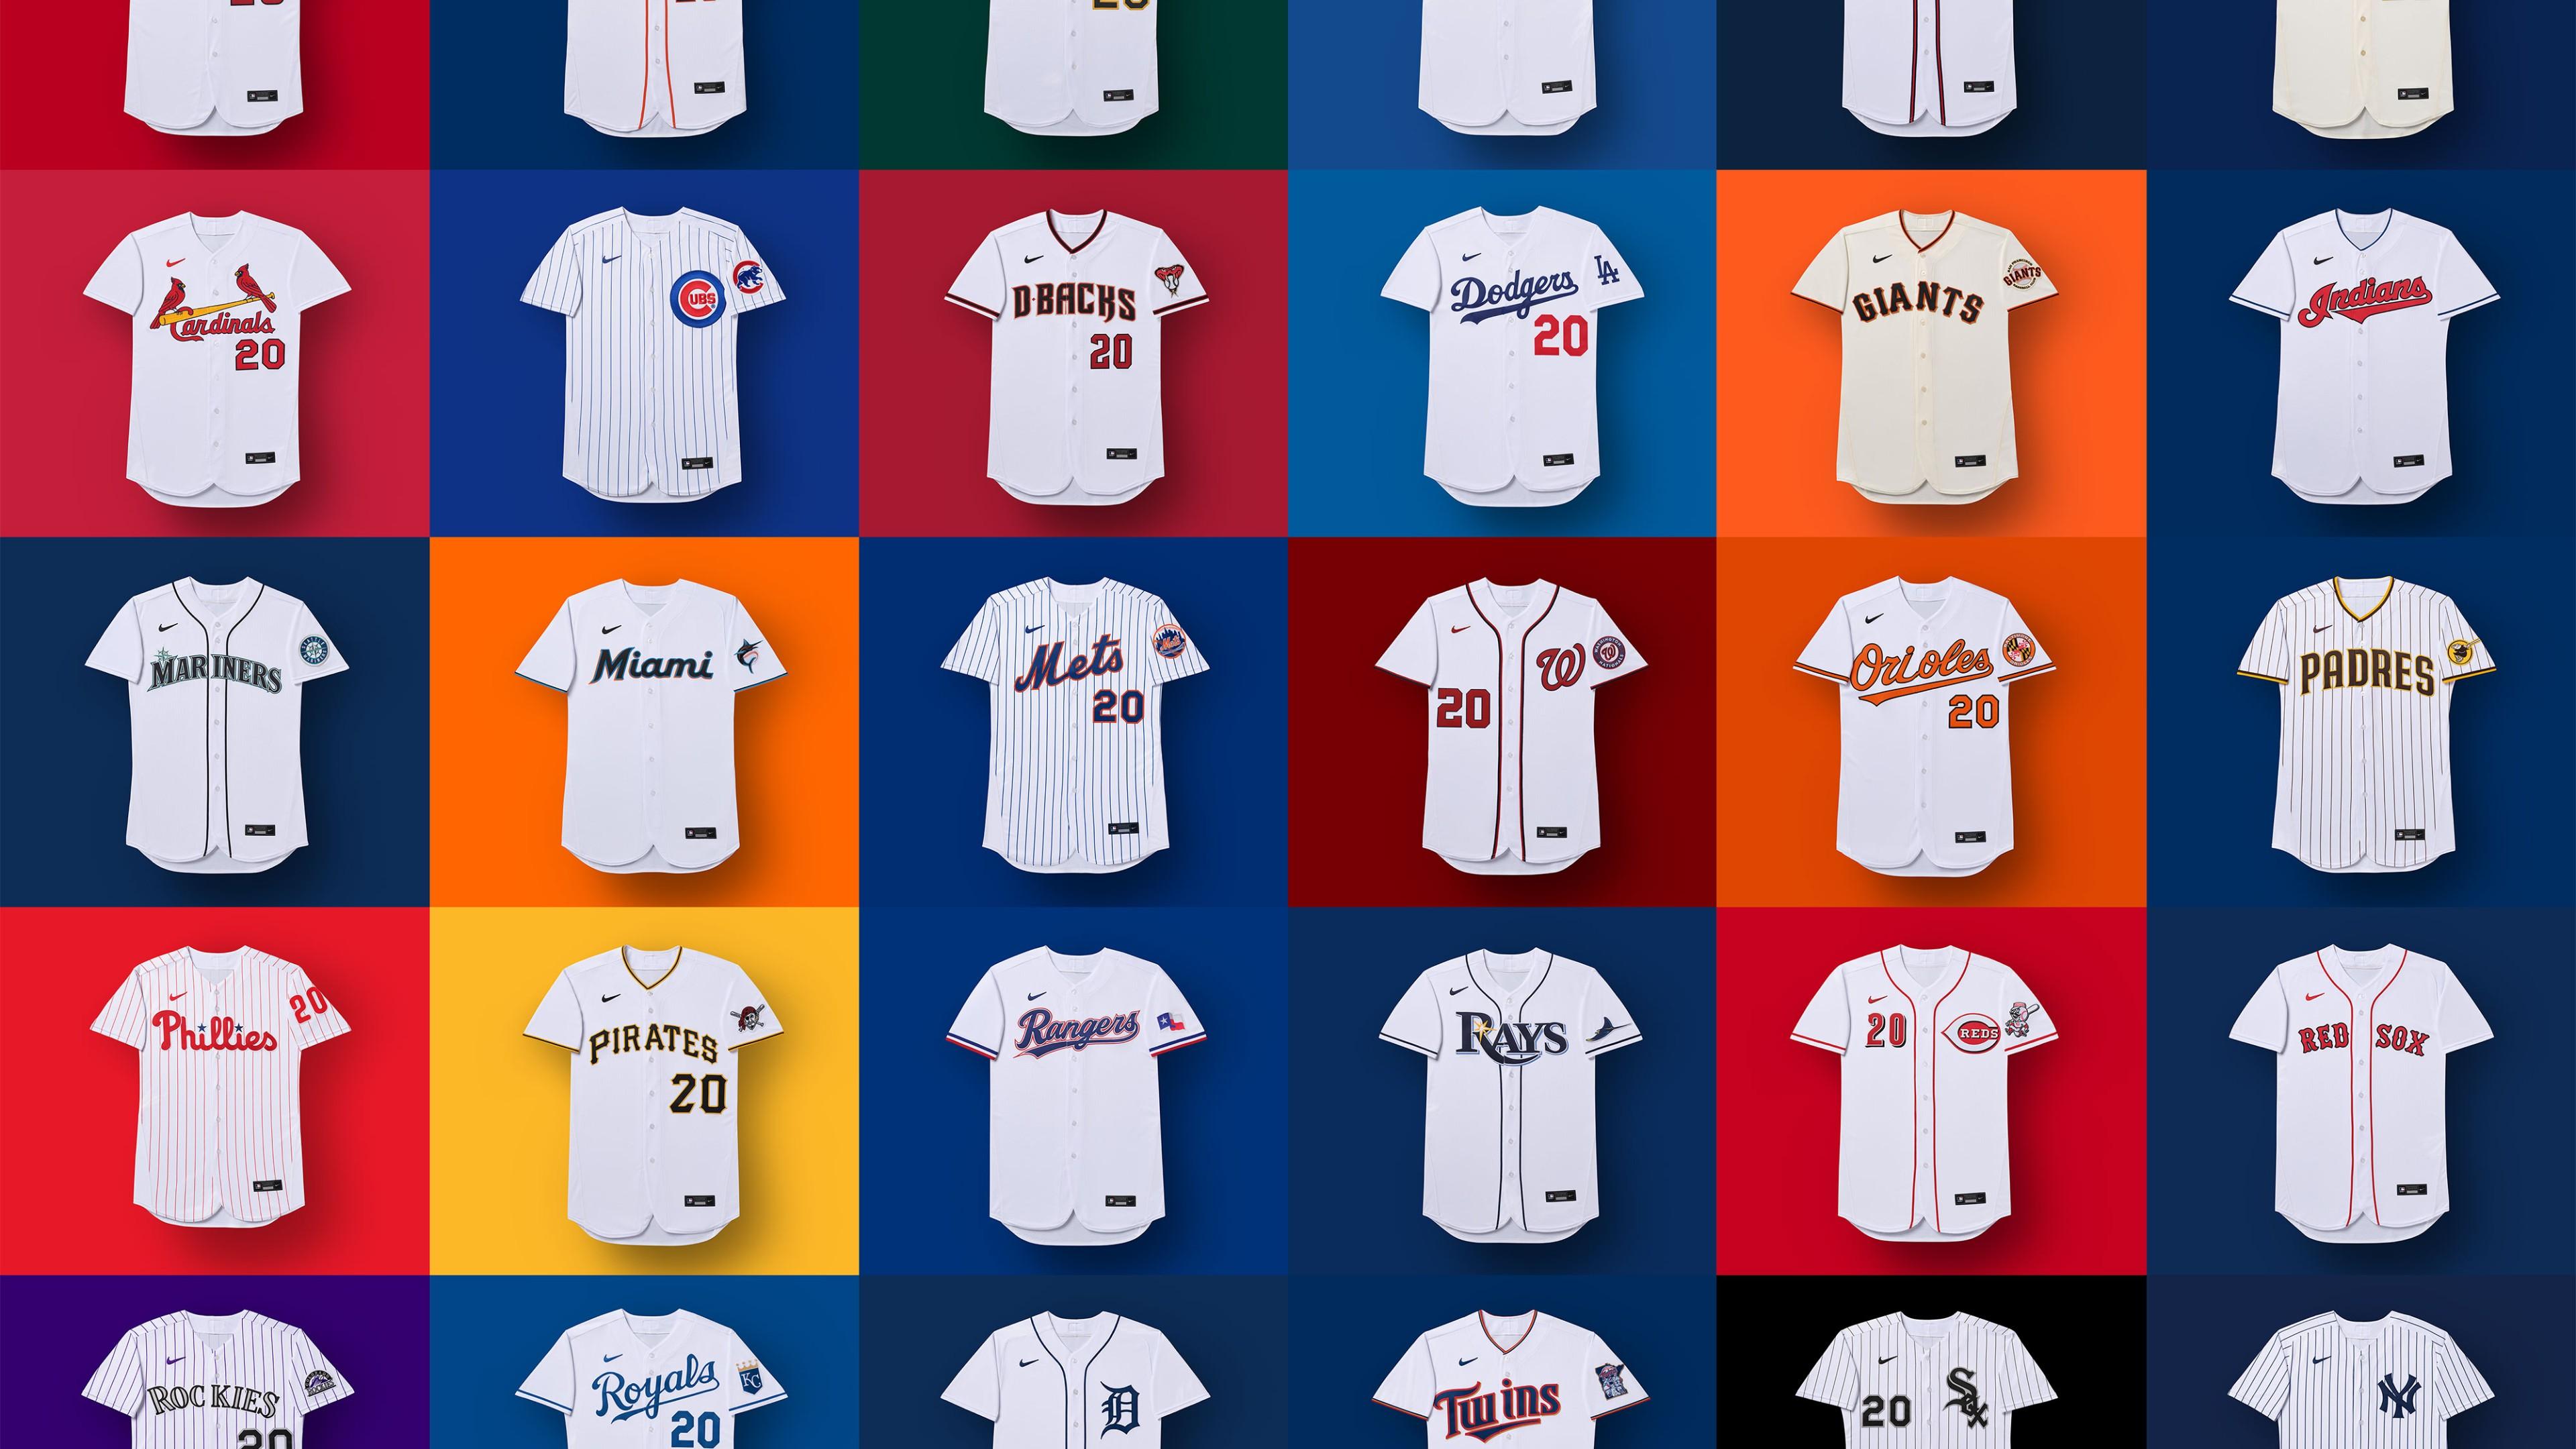 MLB uniforms